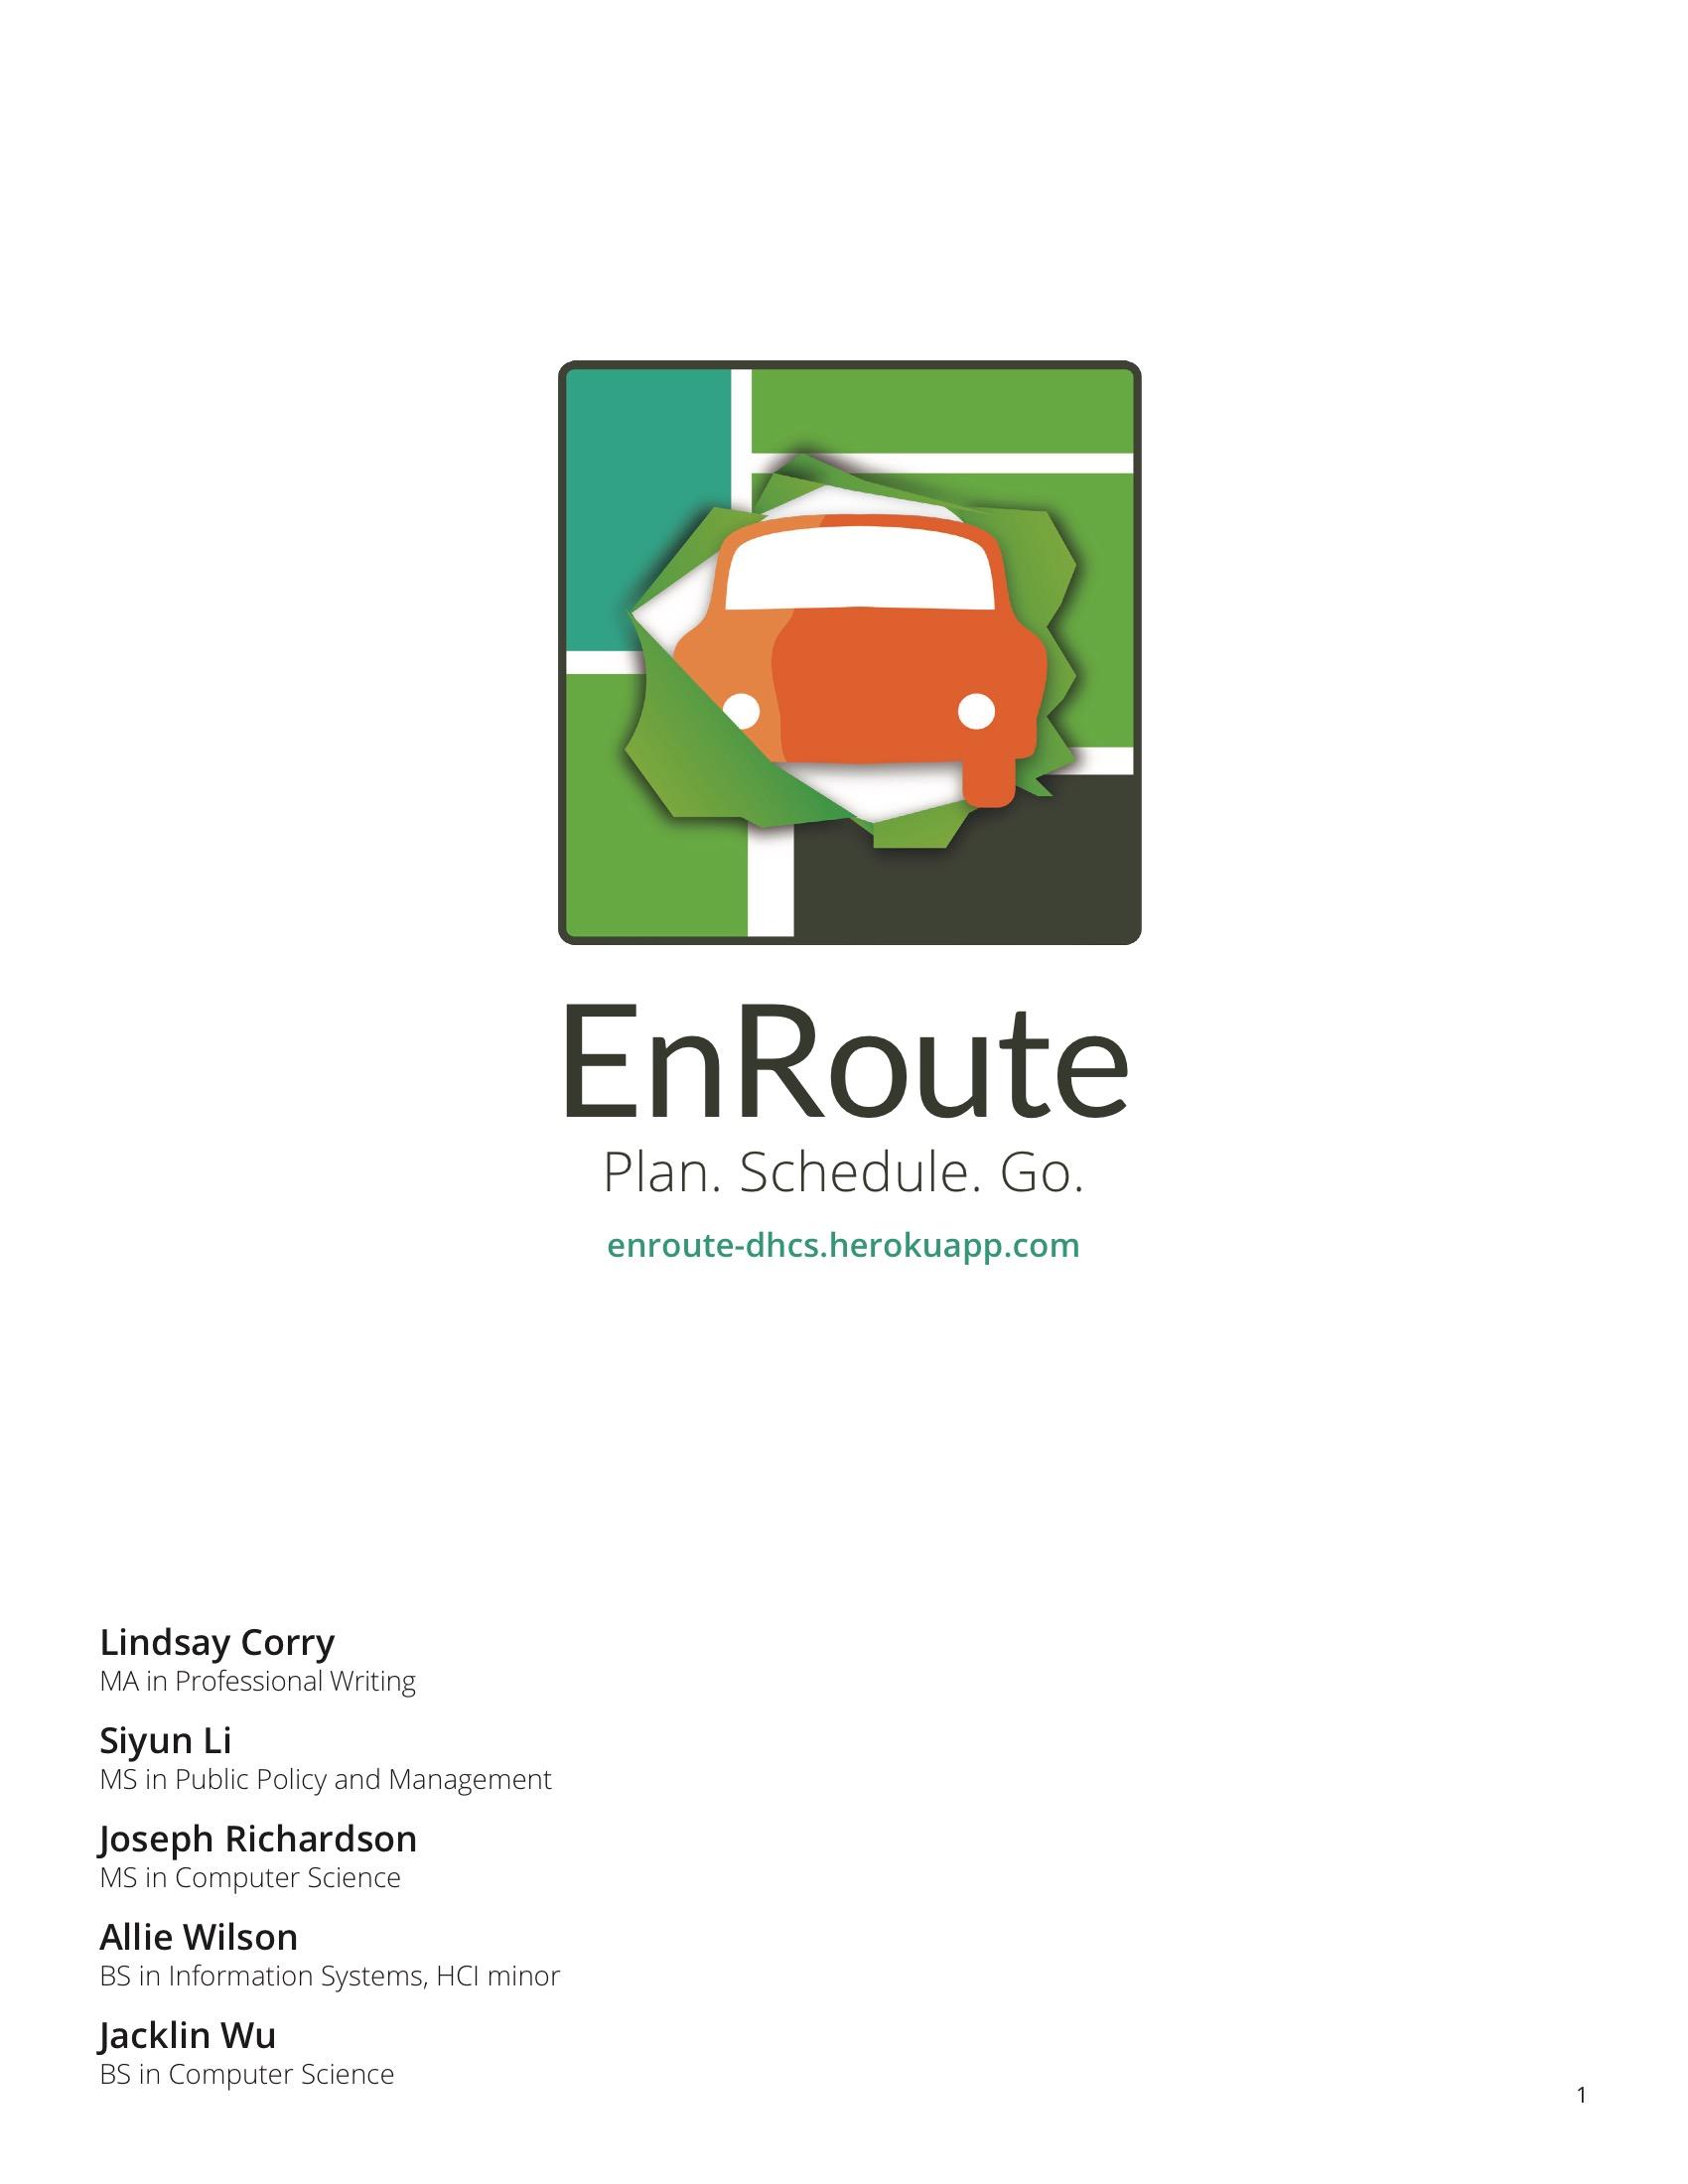 EnRoute_FinalReport-1.jpeg